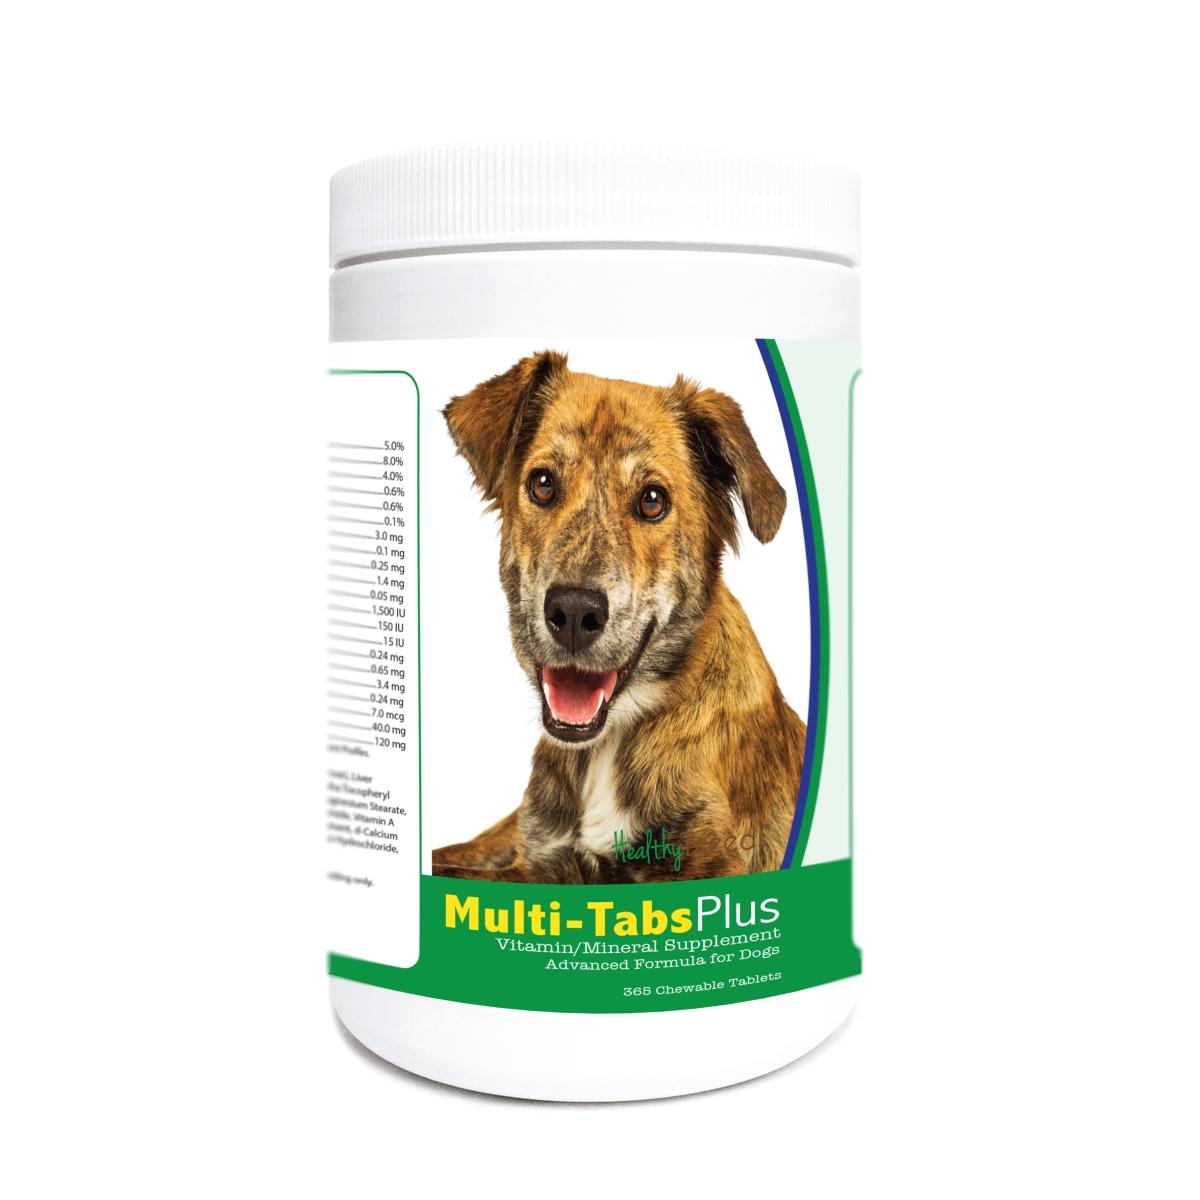 Healthy Breeds 840235180333 Plott Multi-Tabs Plus Chewable Tablets - 365 Count